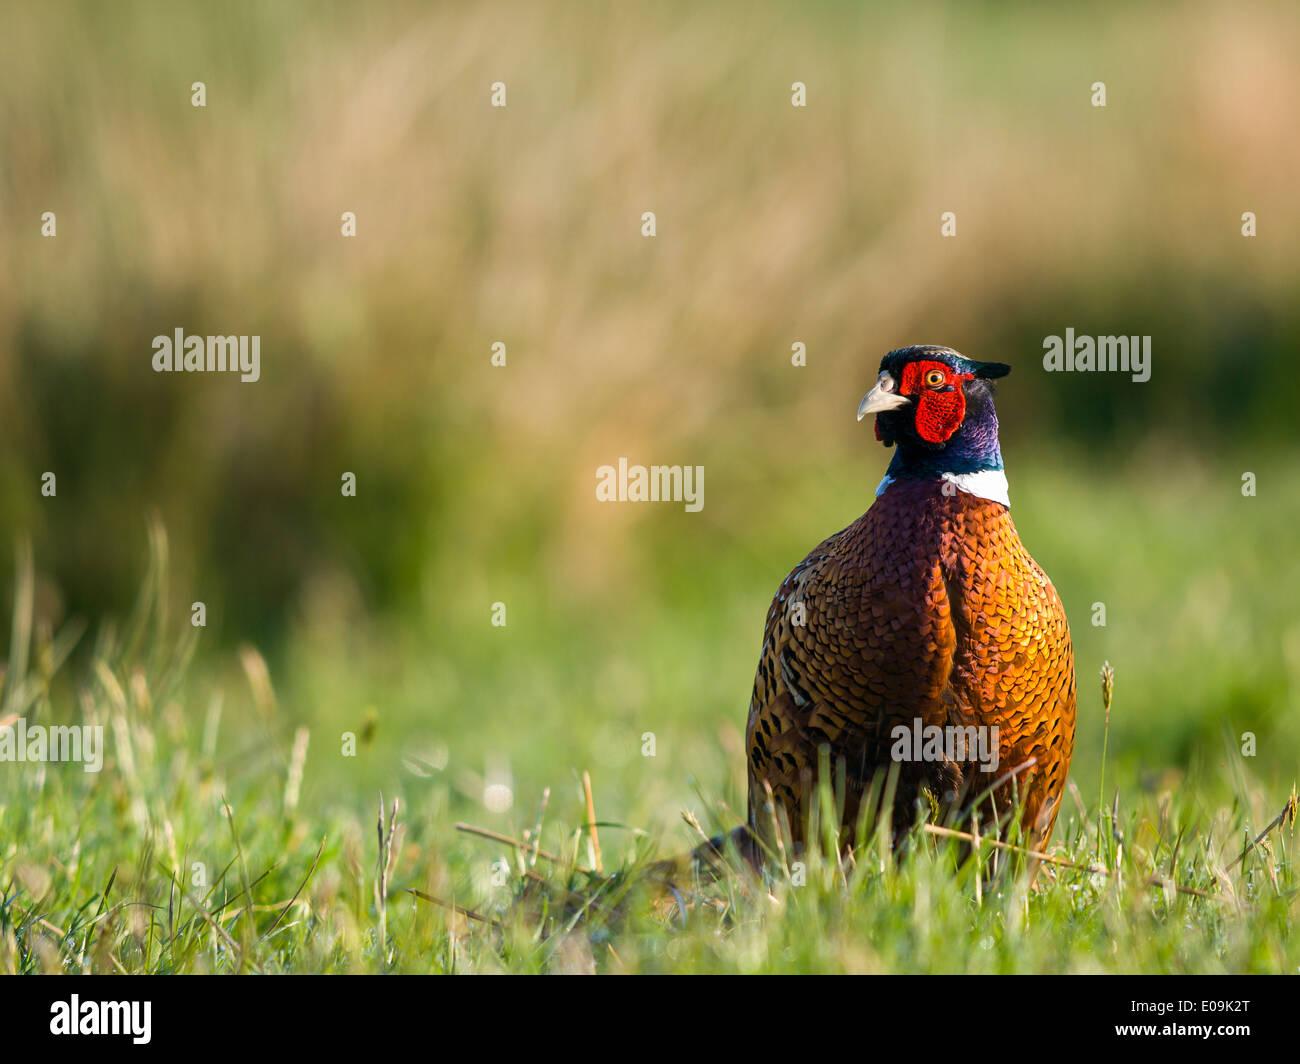 common pheasant, male, phasianus colchicus, germany - Stock Image